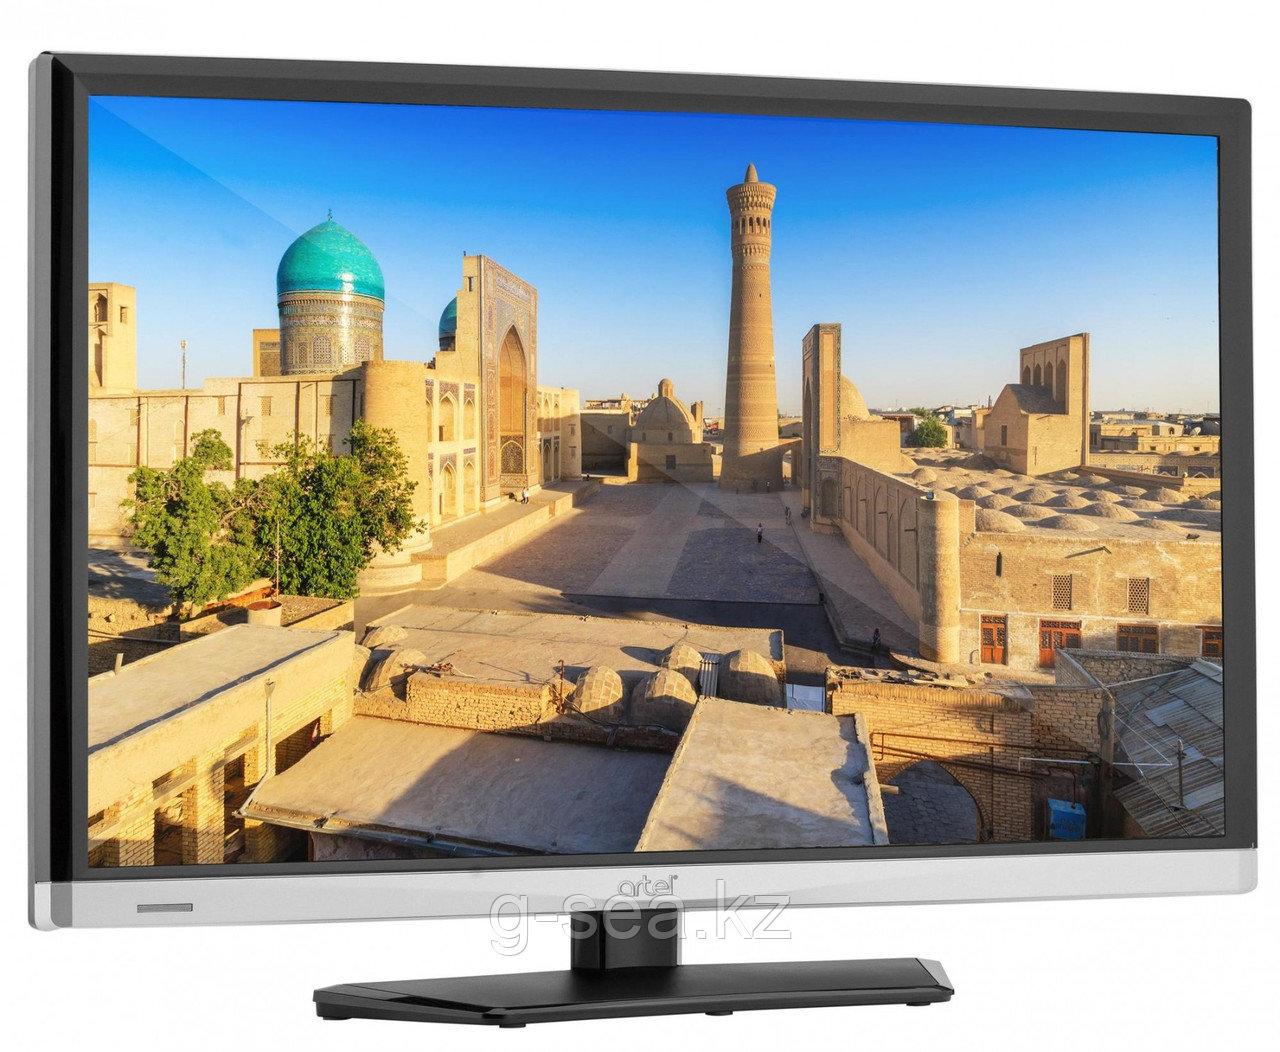 Телевизор Artel LED9000 24 (60см)